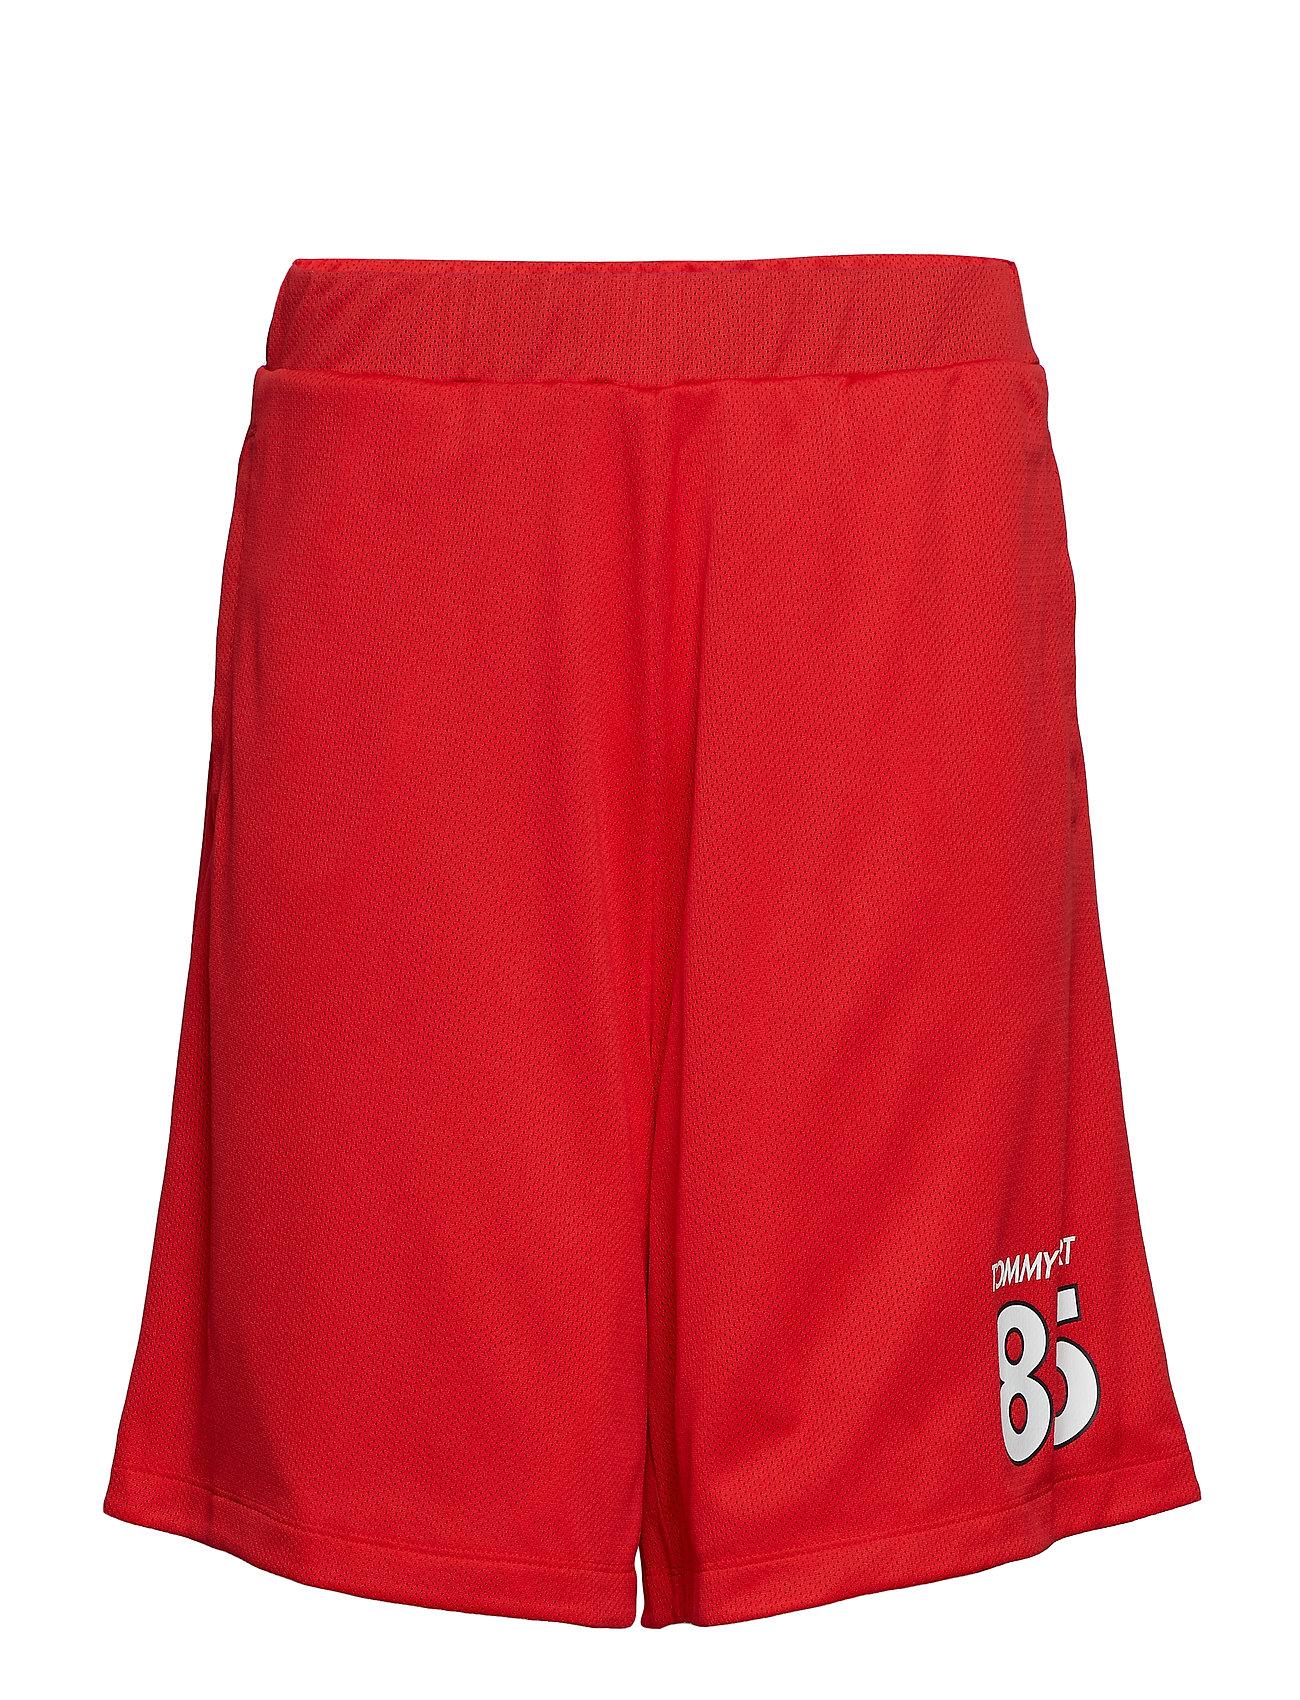 Tommy Sport Short '85' - TRUE RED